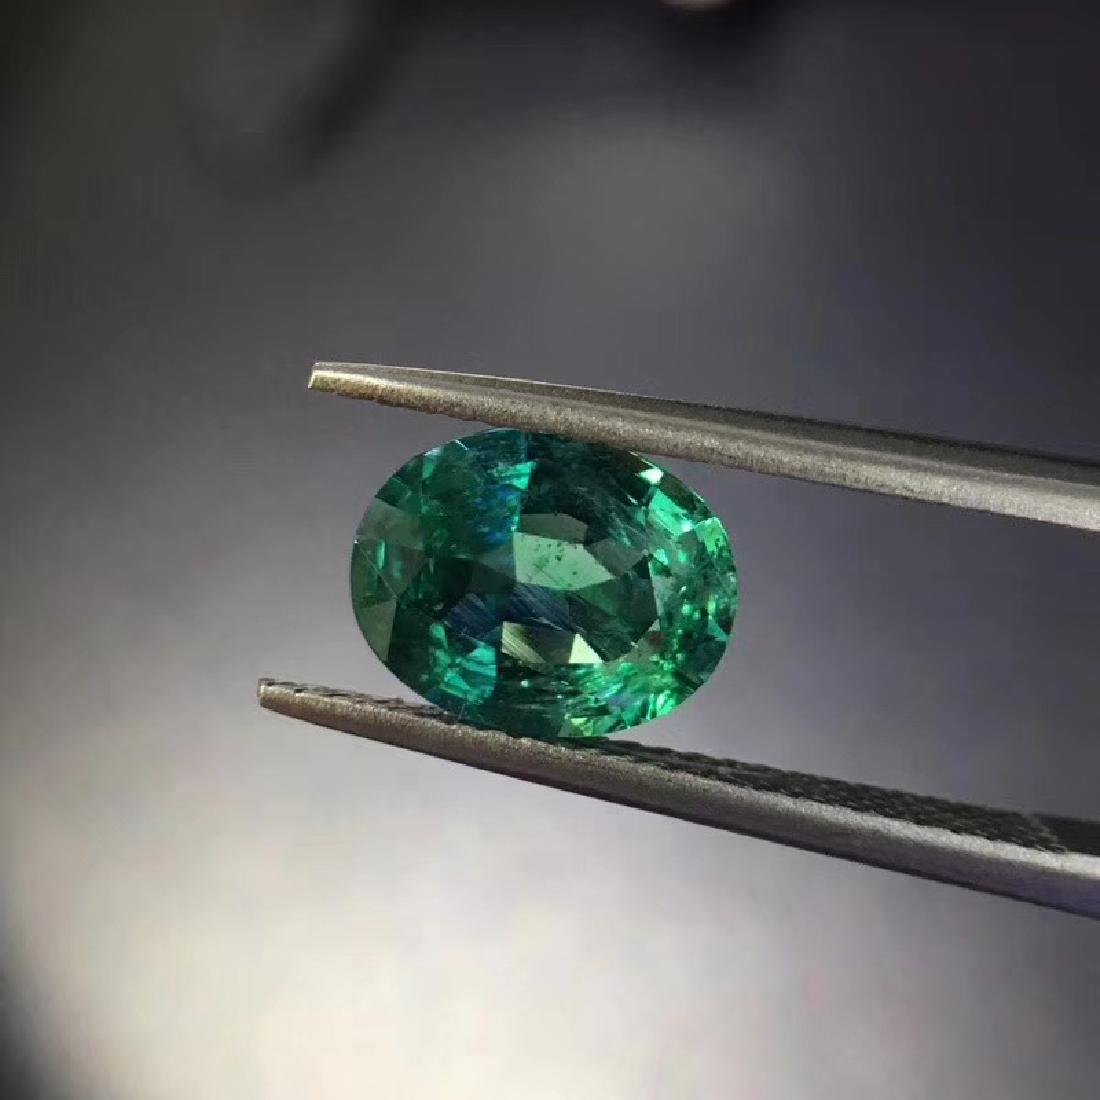 2.04 ct Emerald 7.4*9.4*4.7 mm Oval Cut